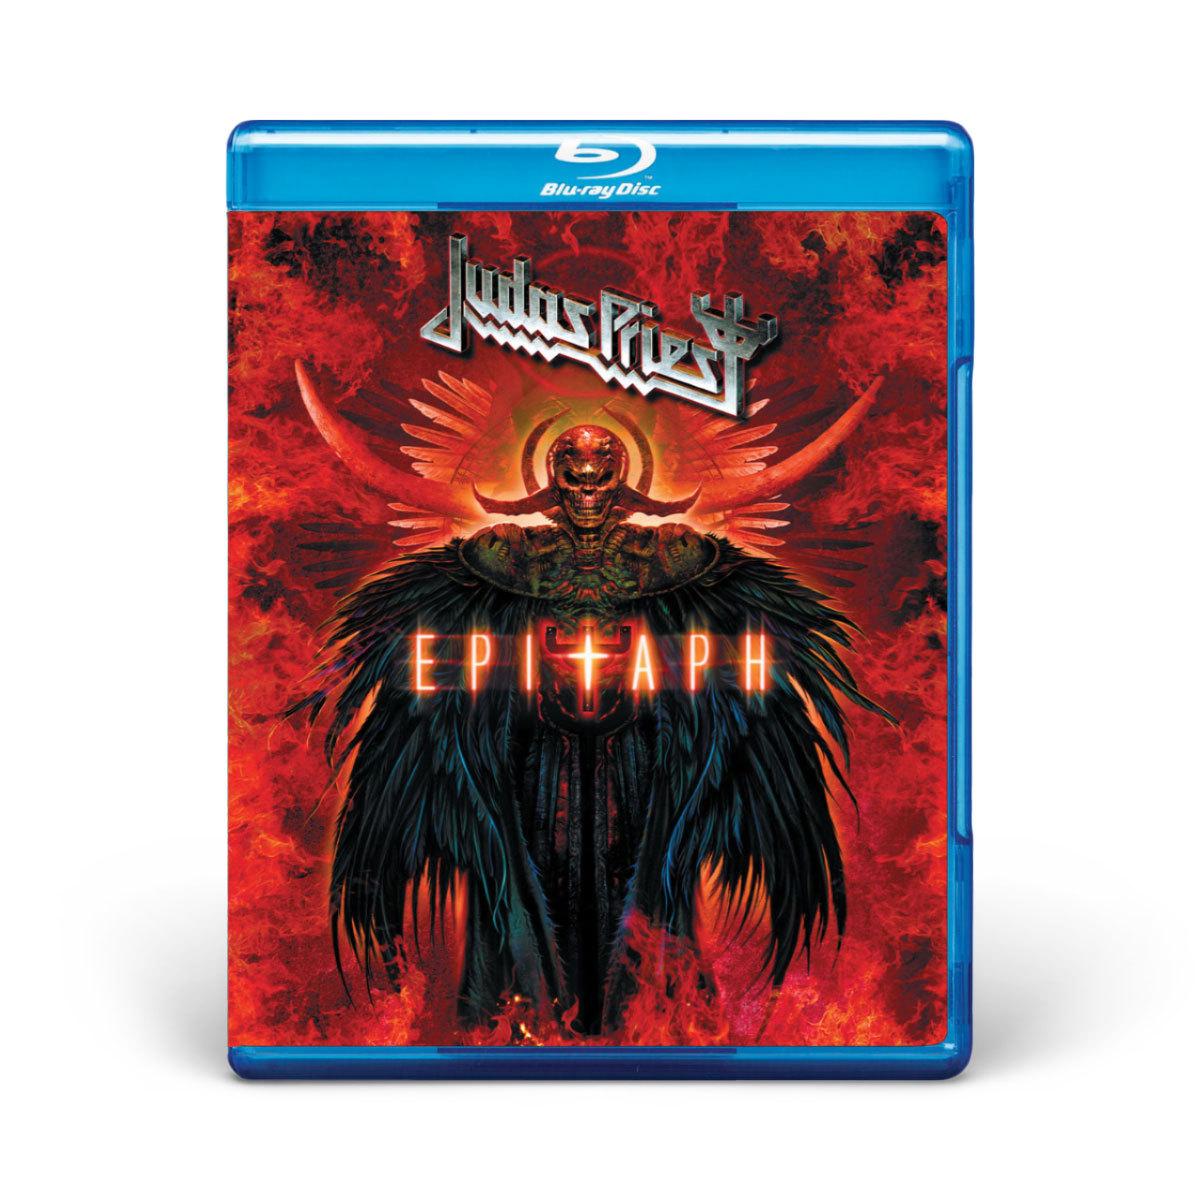 Judas Priest Epitaph BR DVD